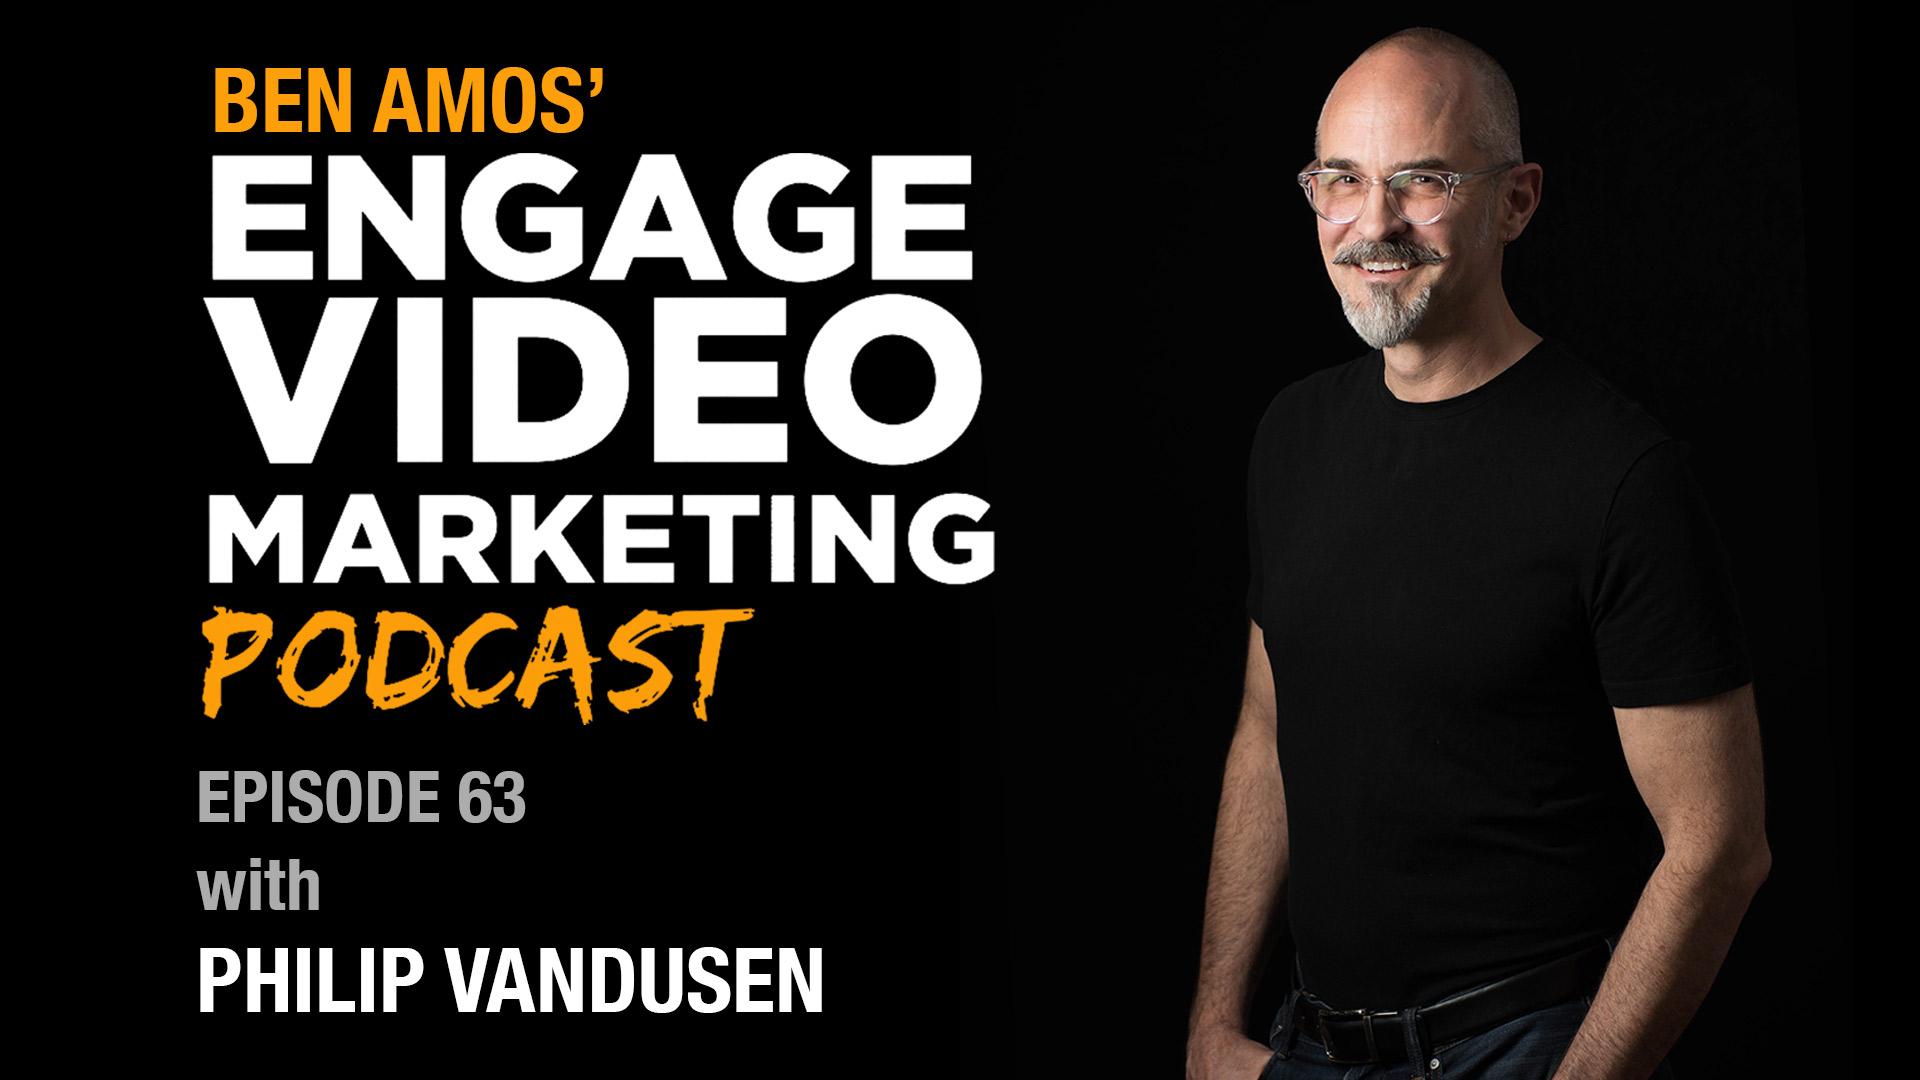 Engage-Video-Marketing-Podcast-Philip-VanDusen.jpg